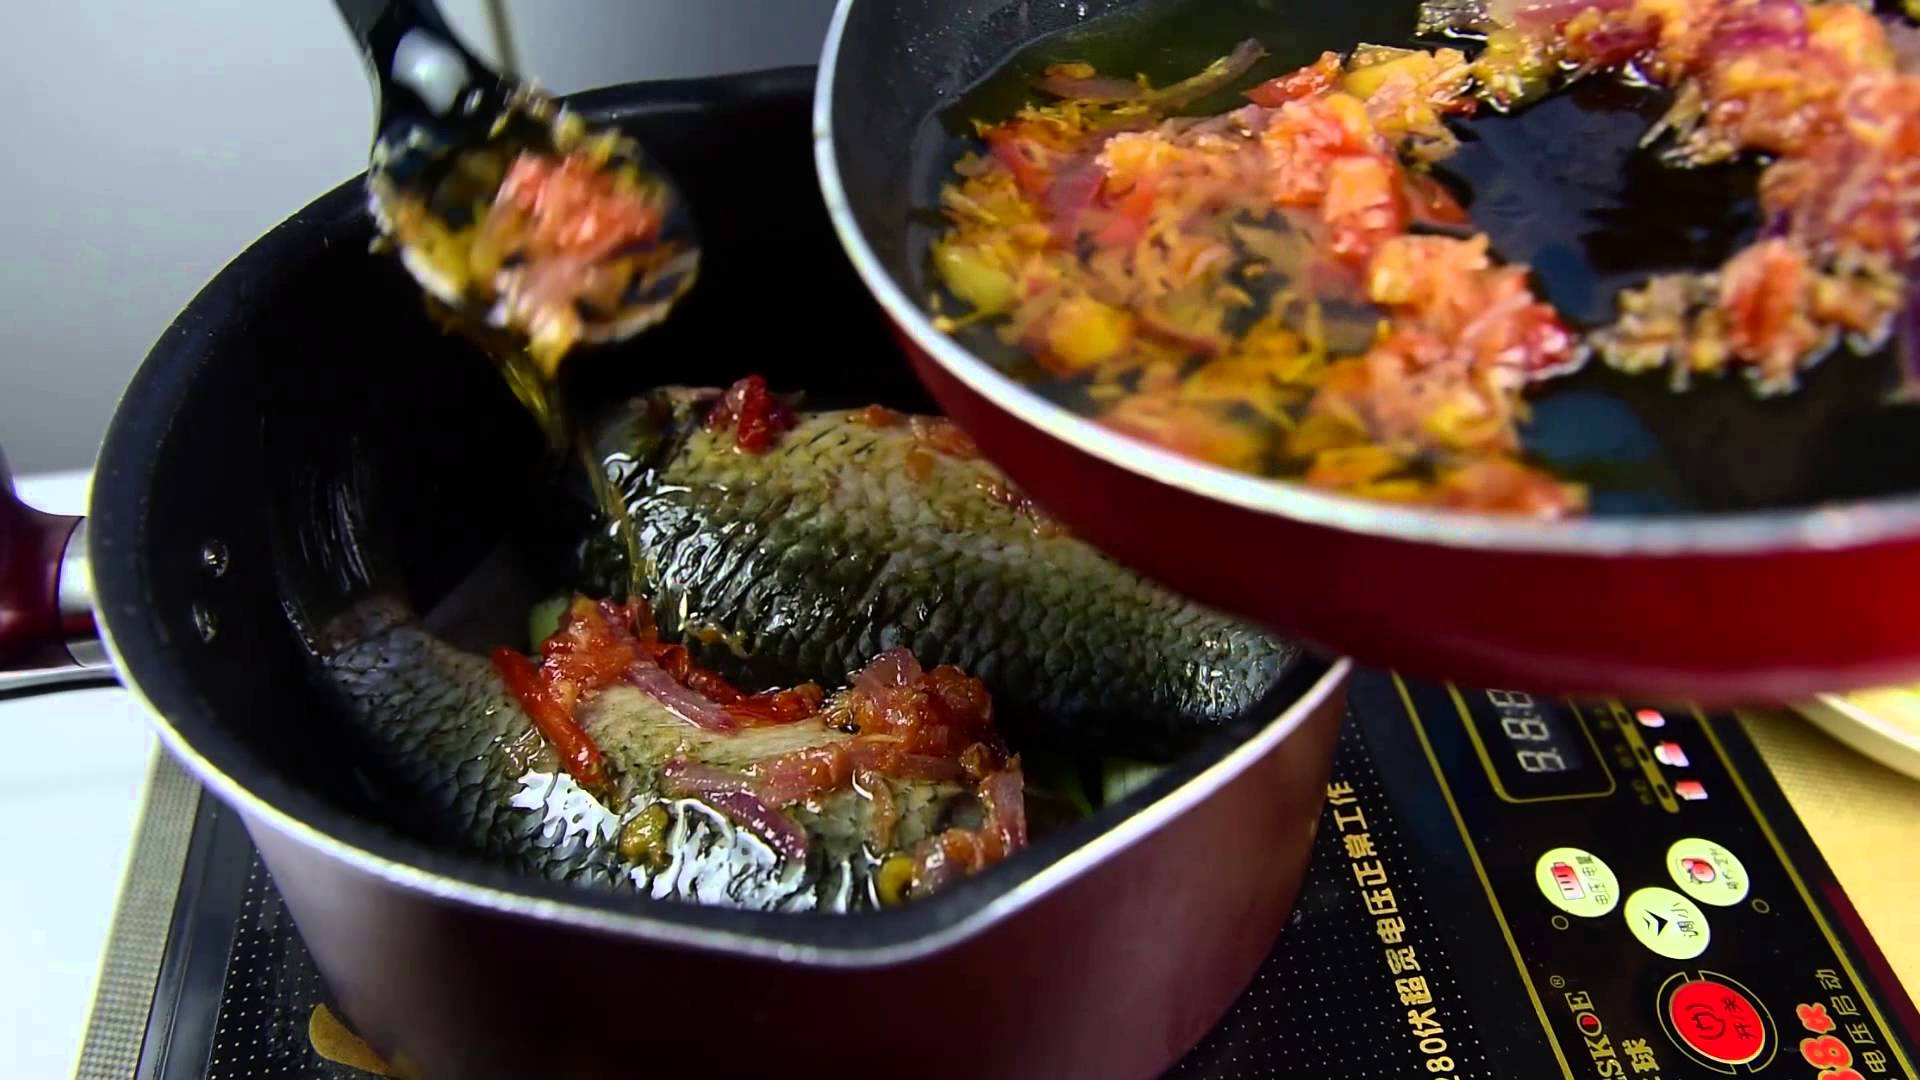 Voici comment cuisiner le poisson la fa on malgache for Poisson a cuisiner